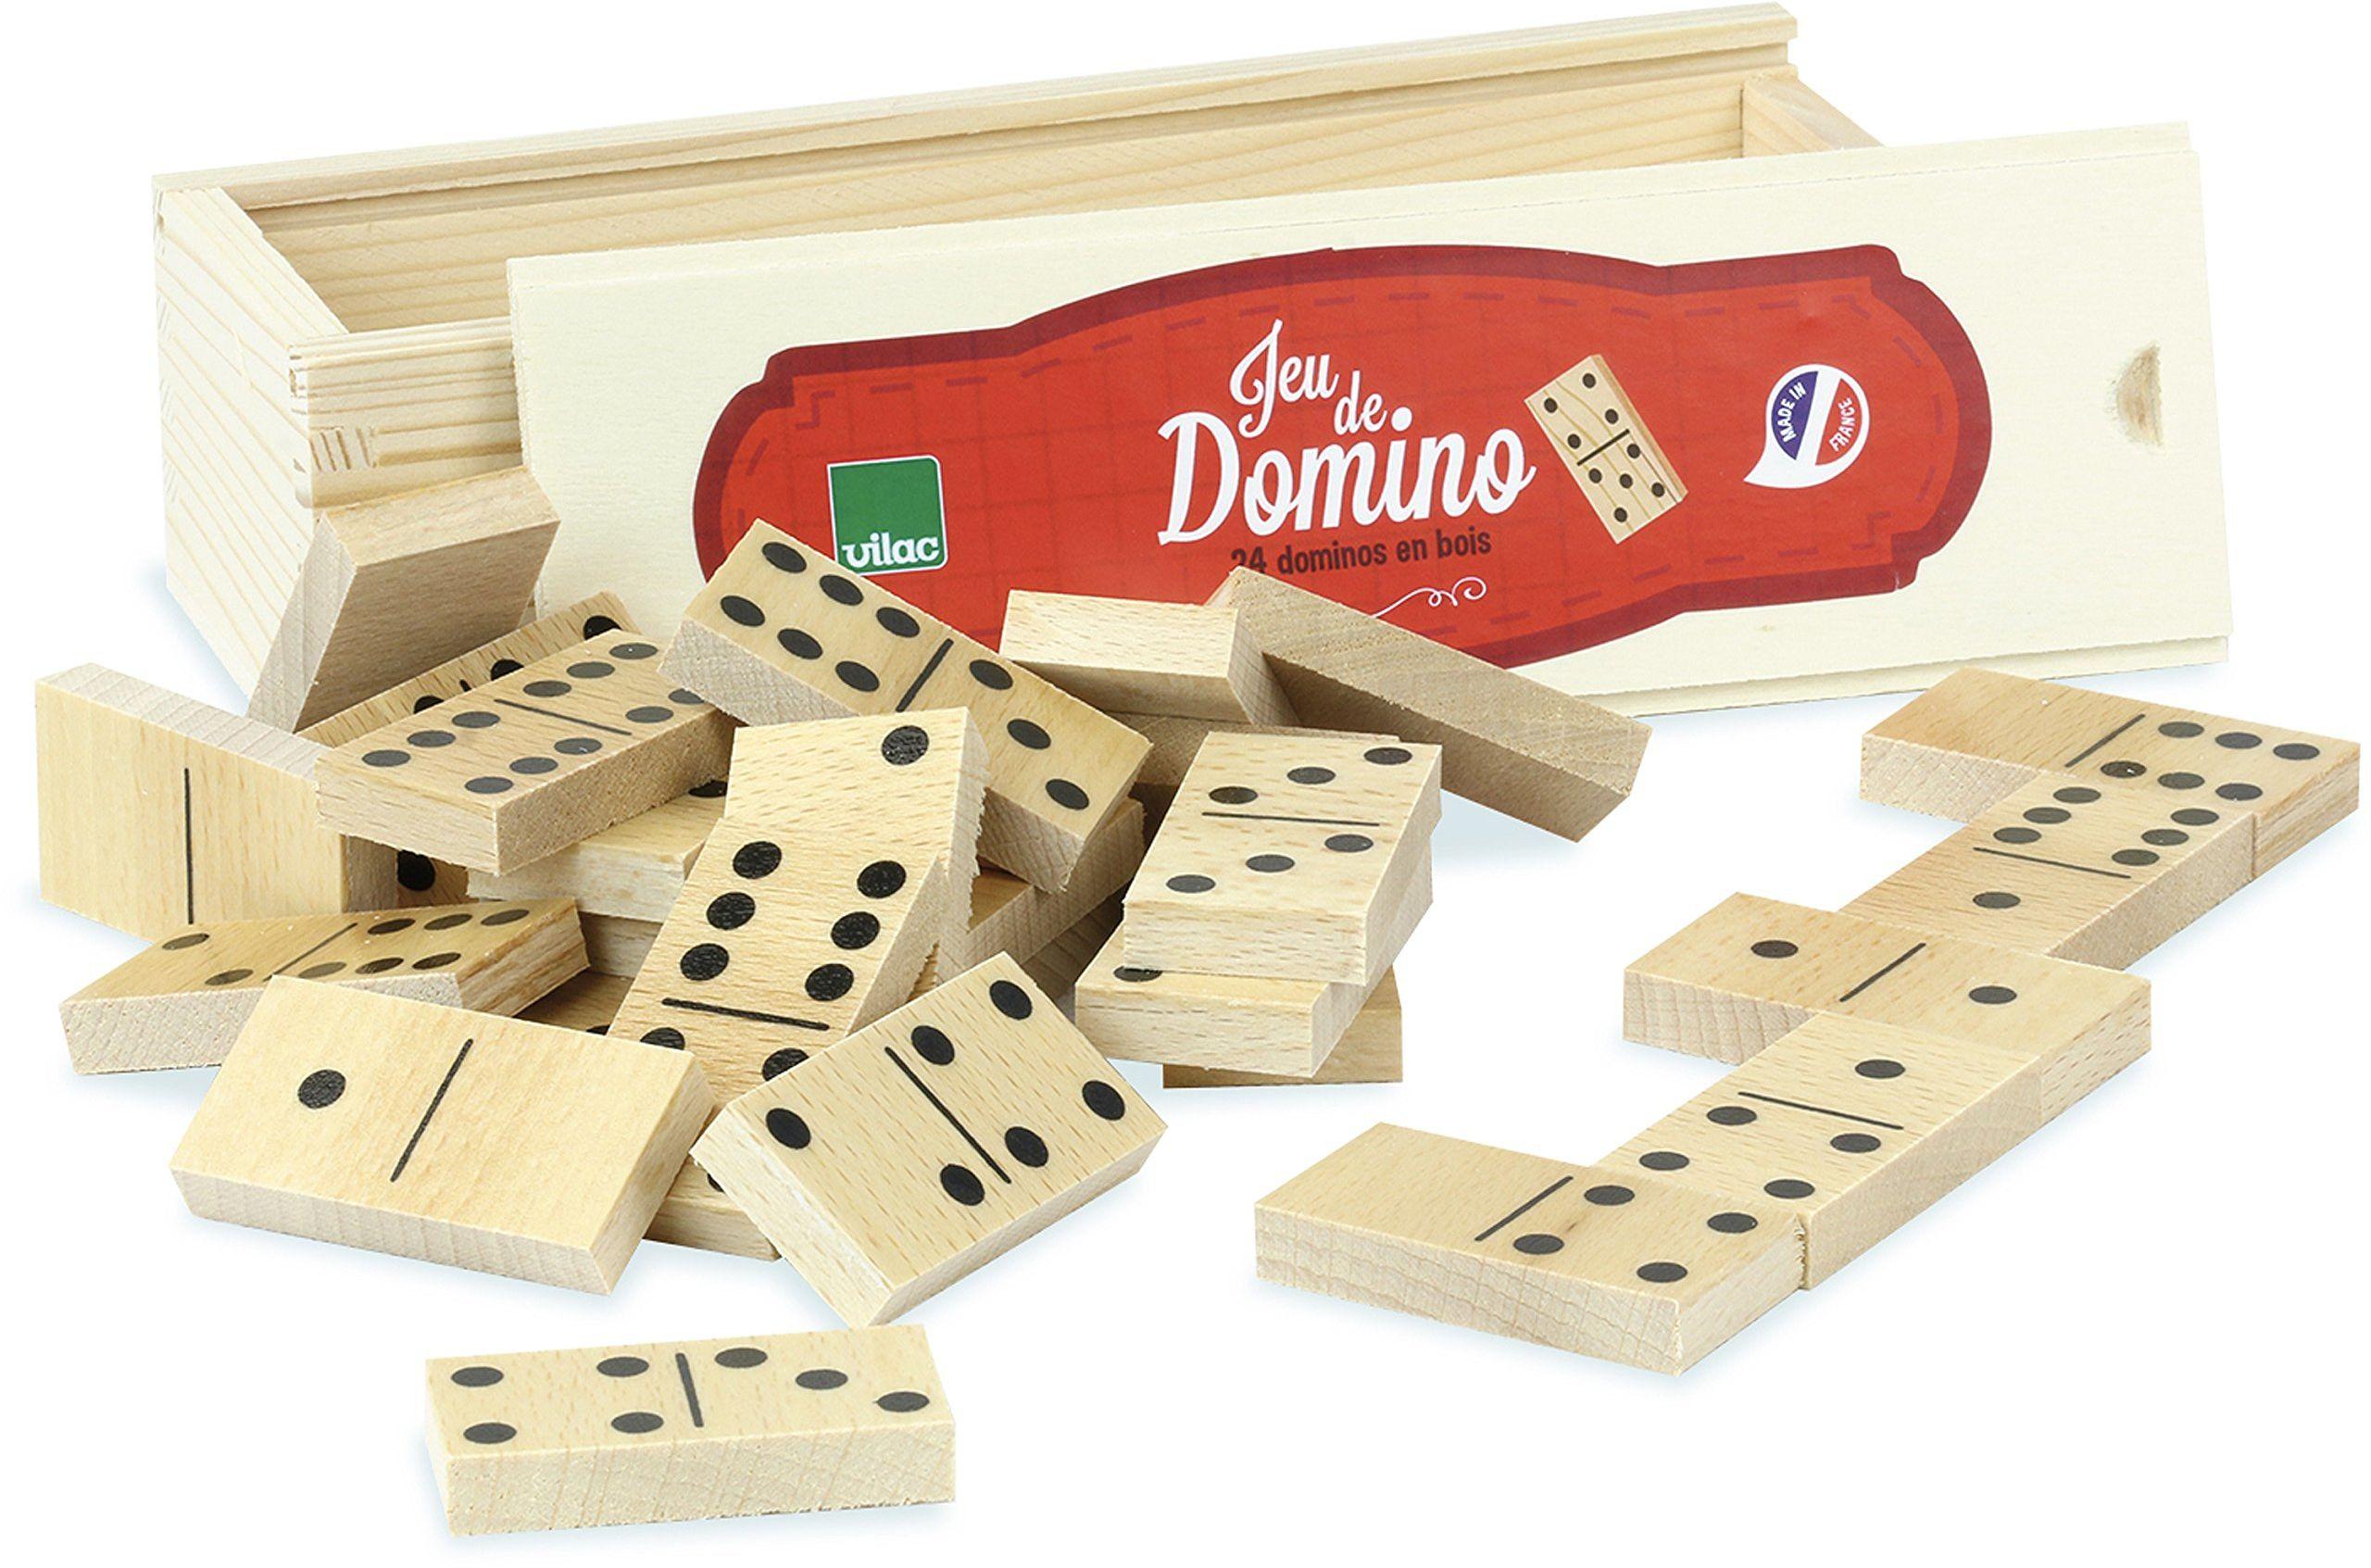 Vilac 6058 Domino Game, wielokolorowa